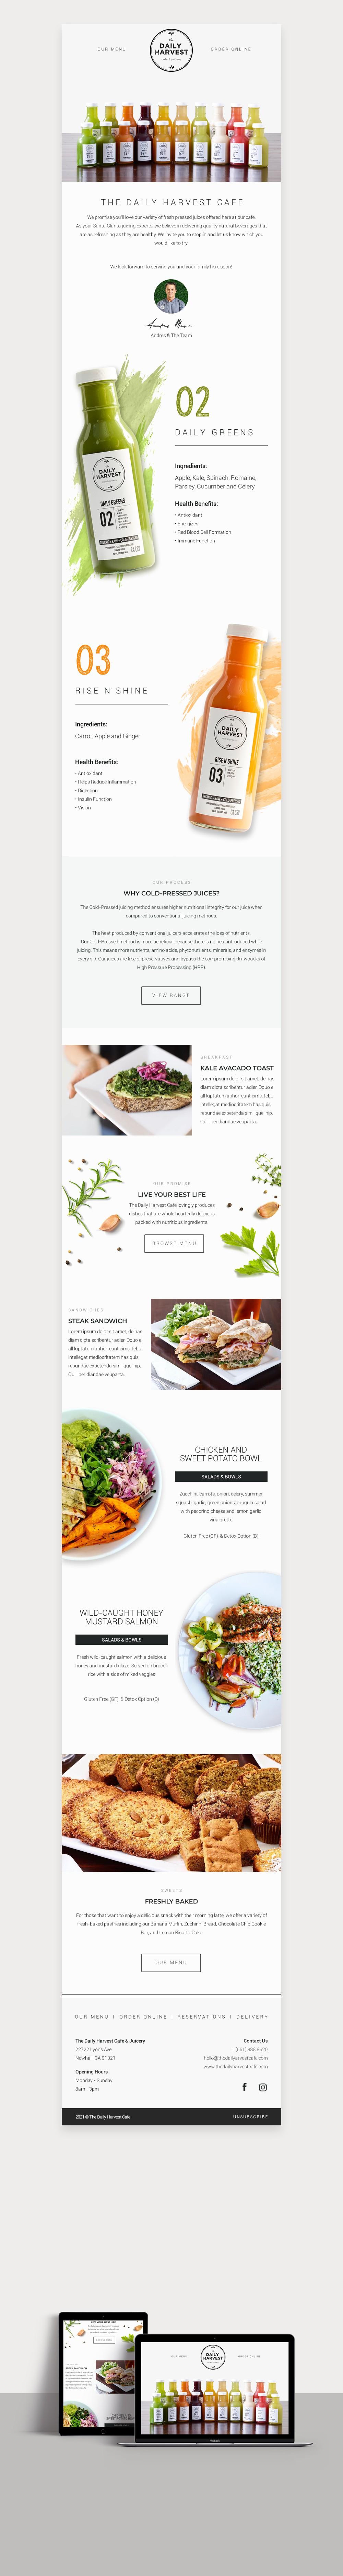 Daily Harvest Cafe HTML Newsletter - Mailchimp